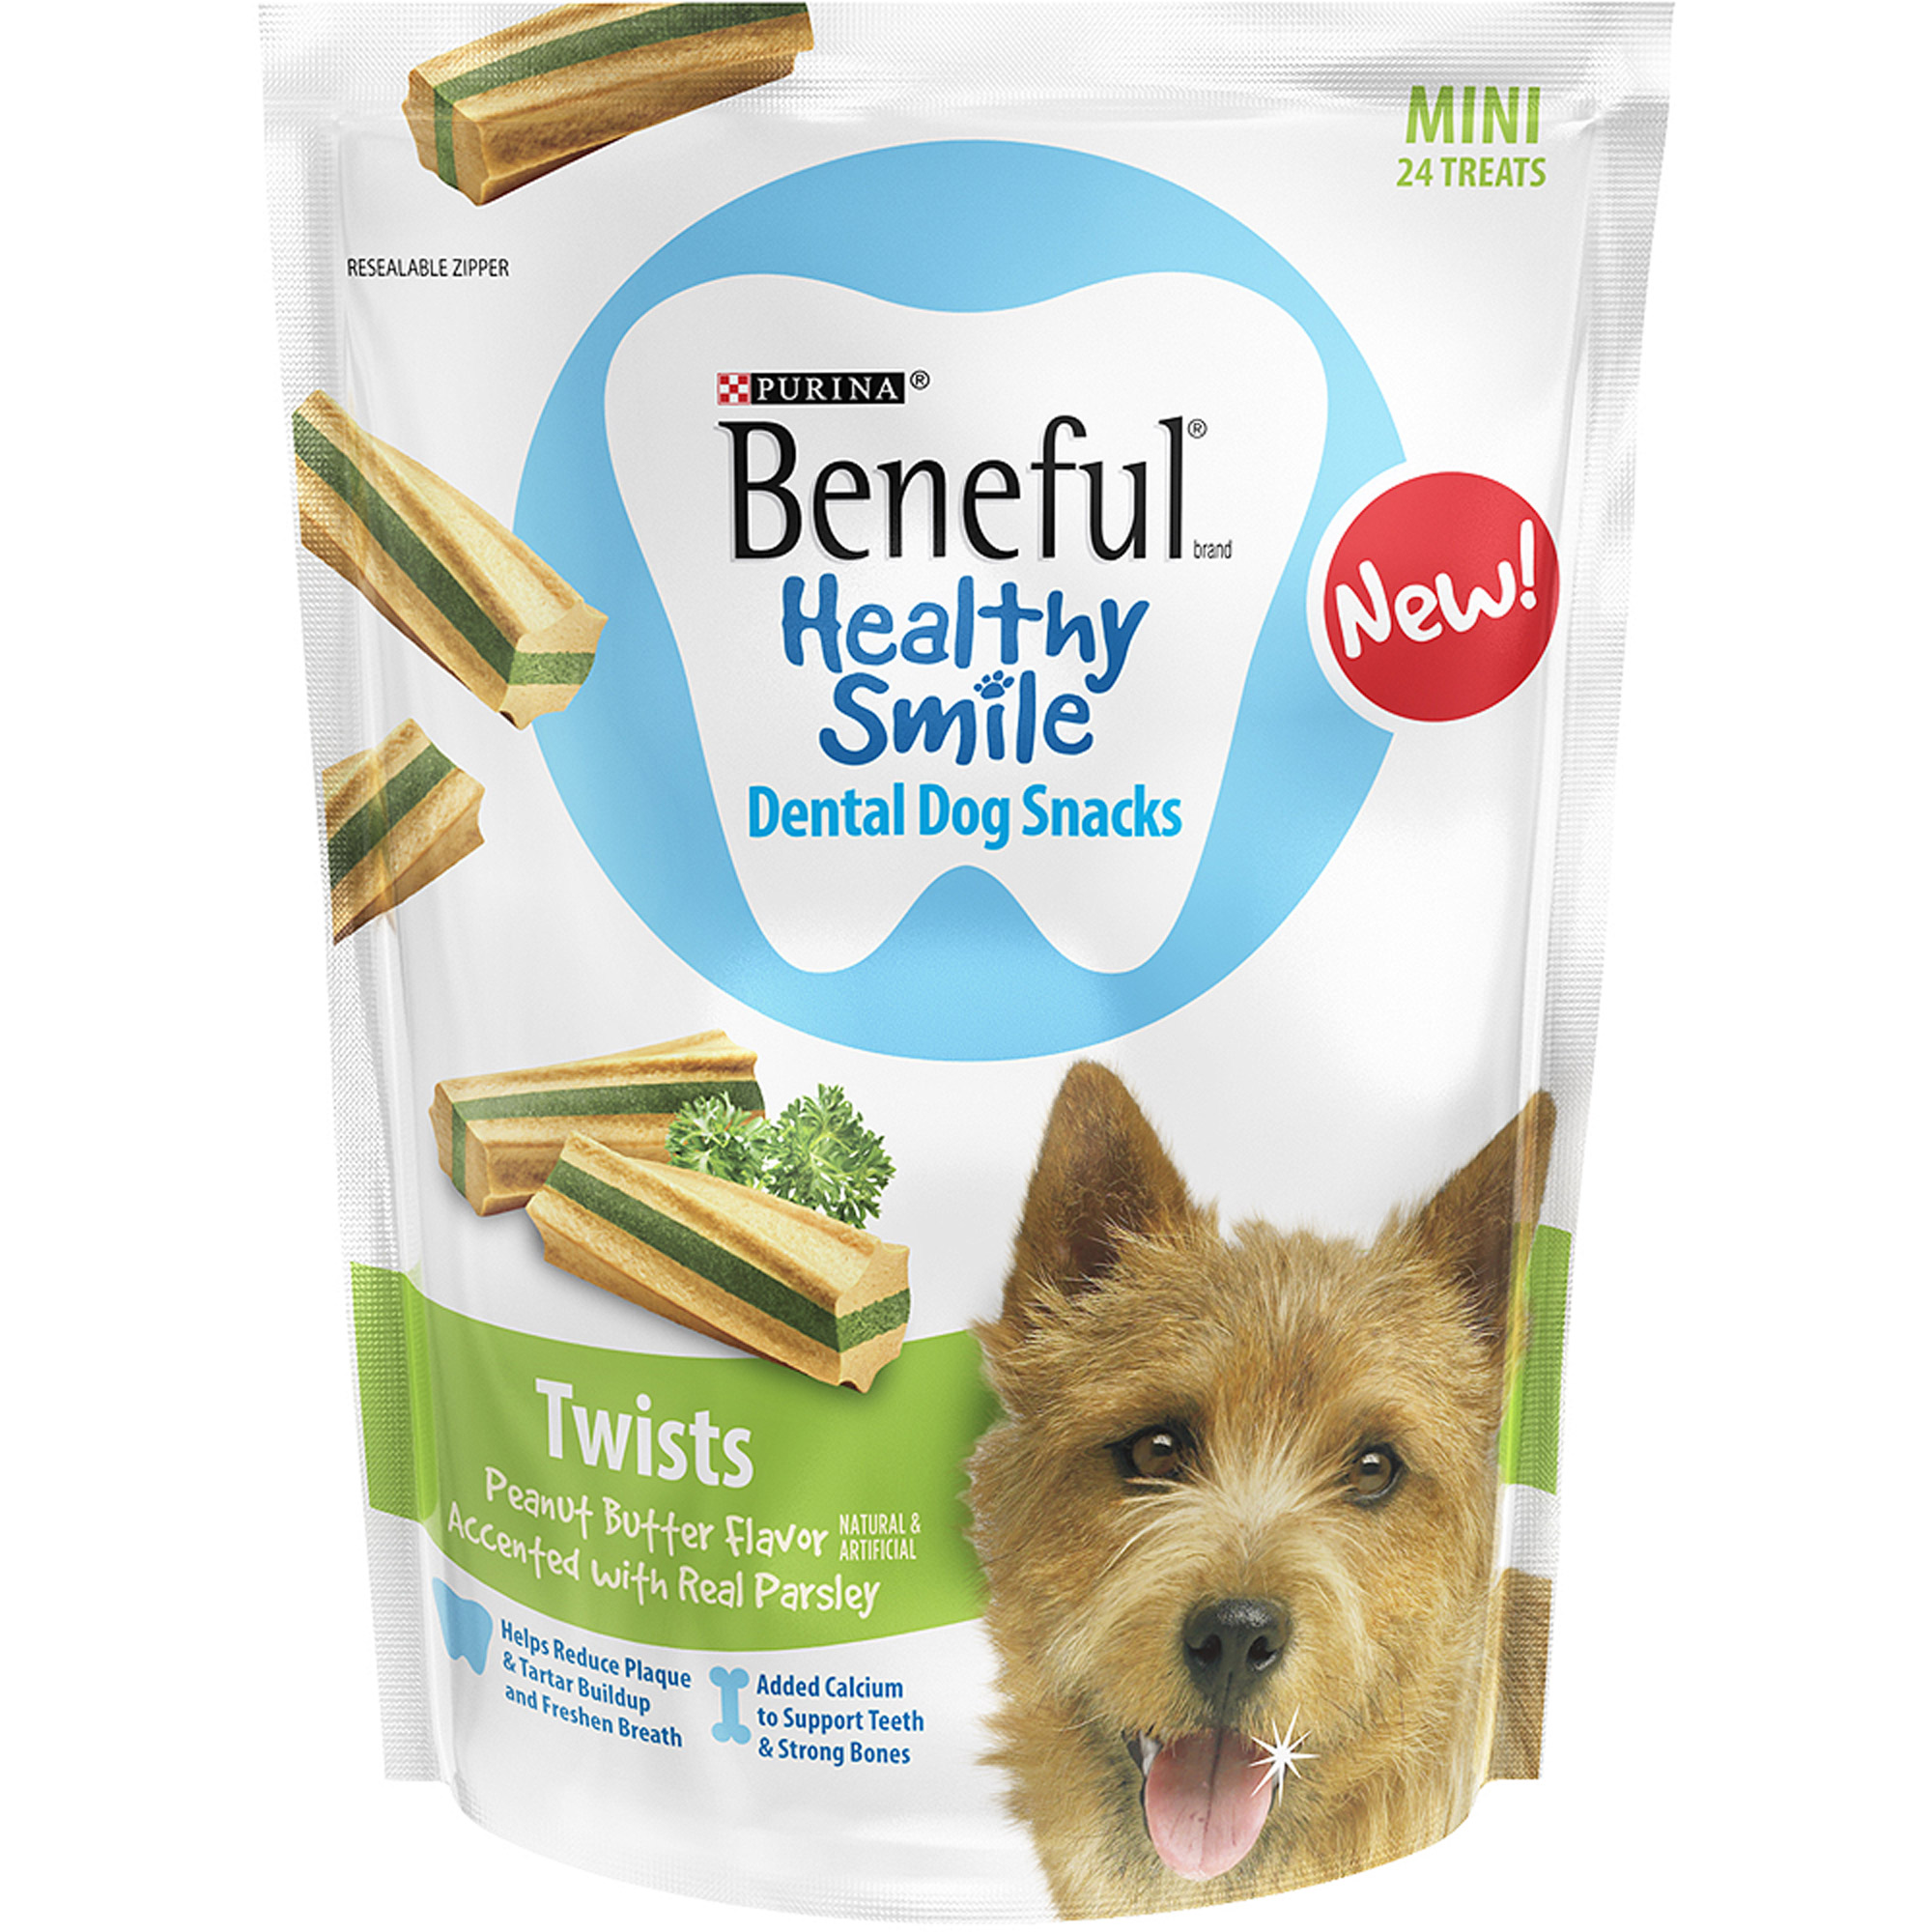 Purina Beneful Healthy Smile Dental Dog Treats Adult Mini Twists 8.4 oz. Pouch